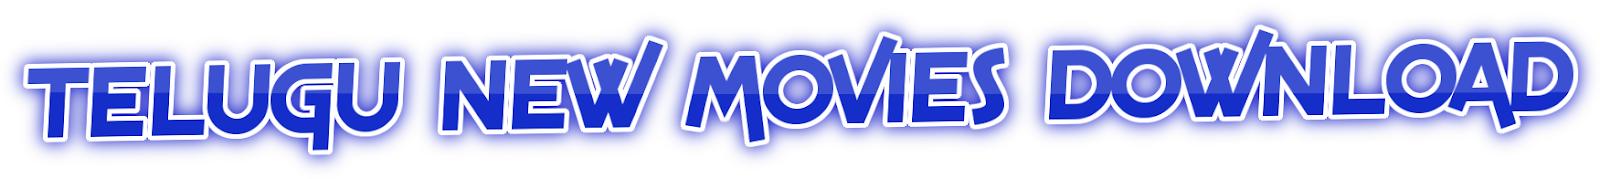 Telugu New Movies Download - Telugu Movies 2018 Full Movies Download   Telugu Movies Download